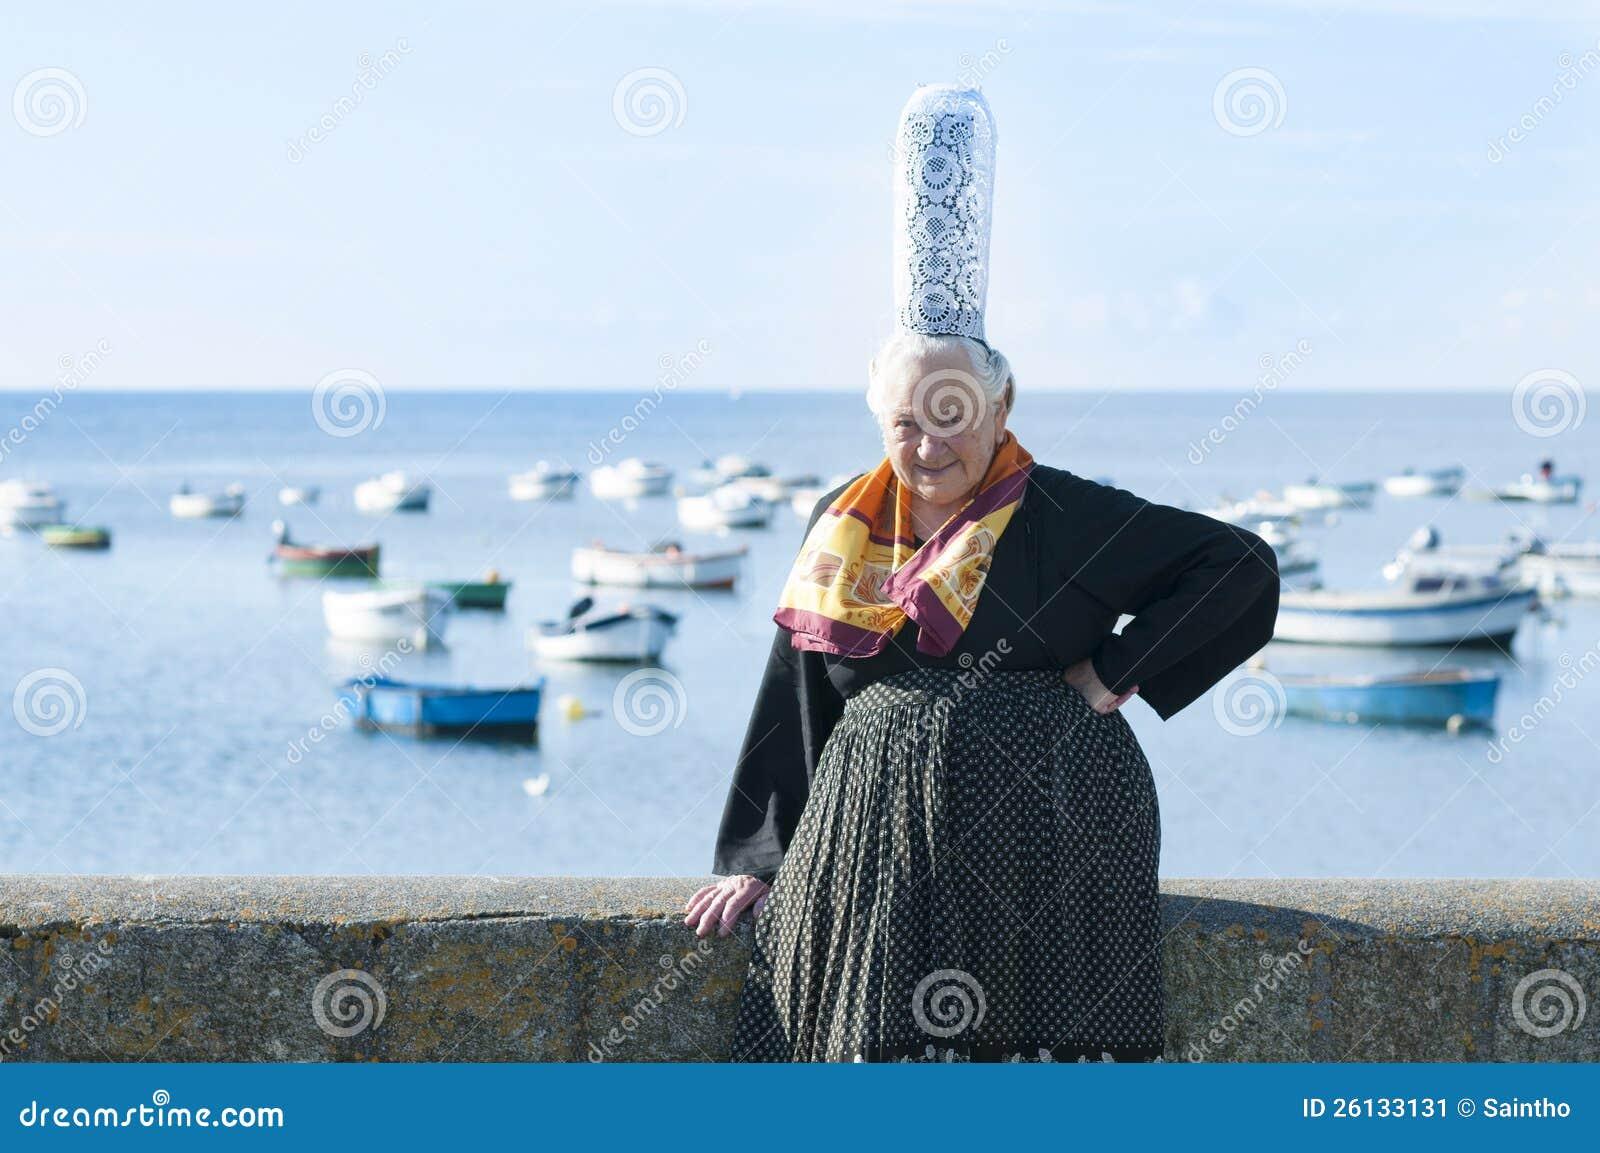 les femmes bretons avec la coiffe bigouden image stock image 26133131. Black Bedroom Furniture Sets. Home Design Ideas